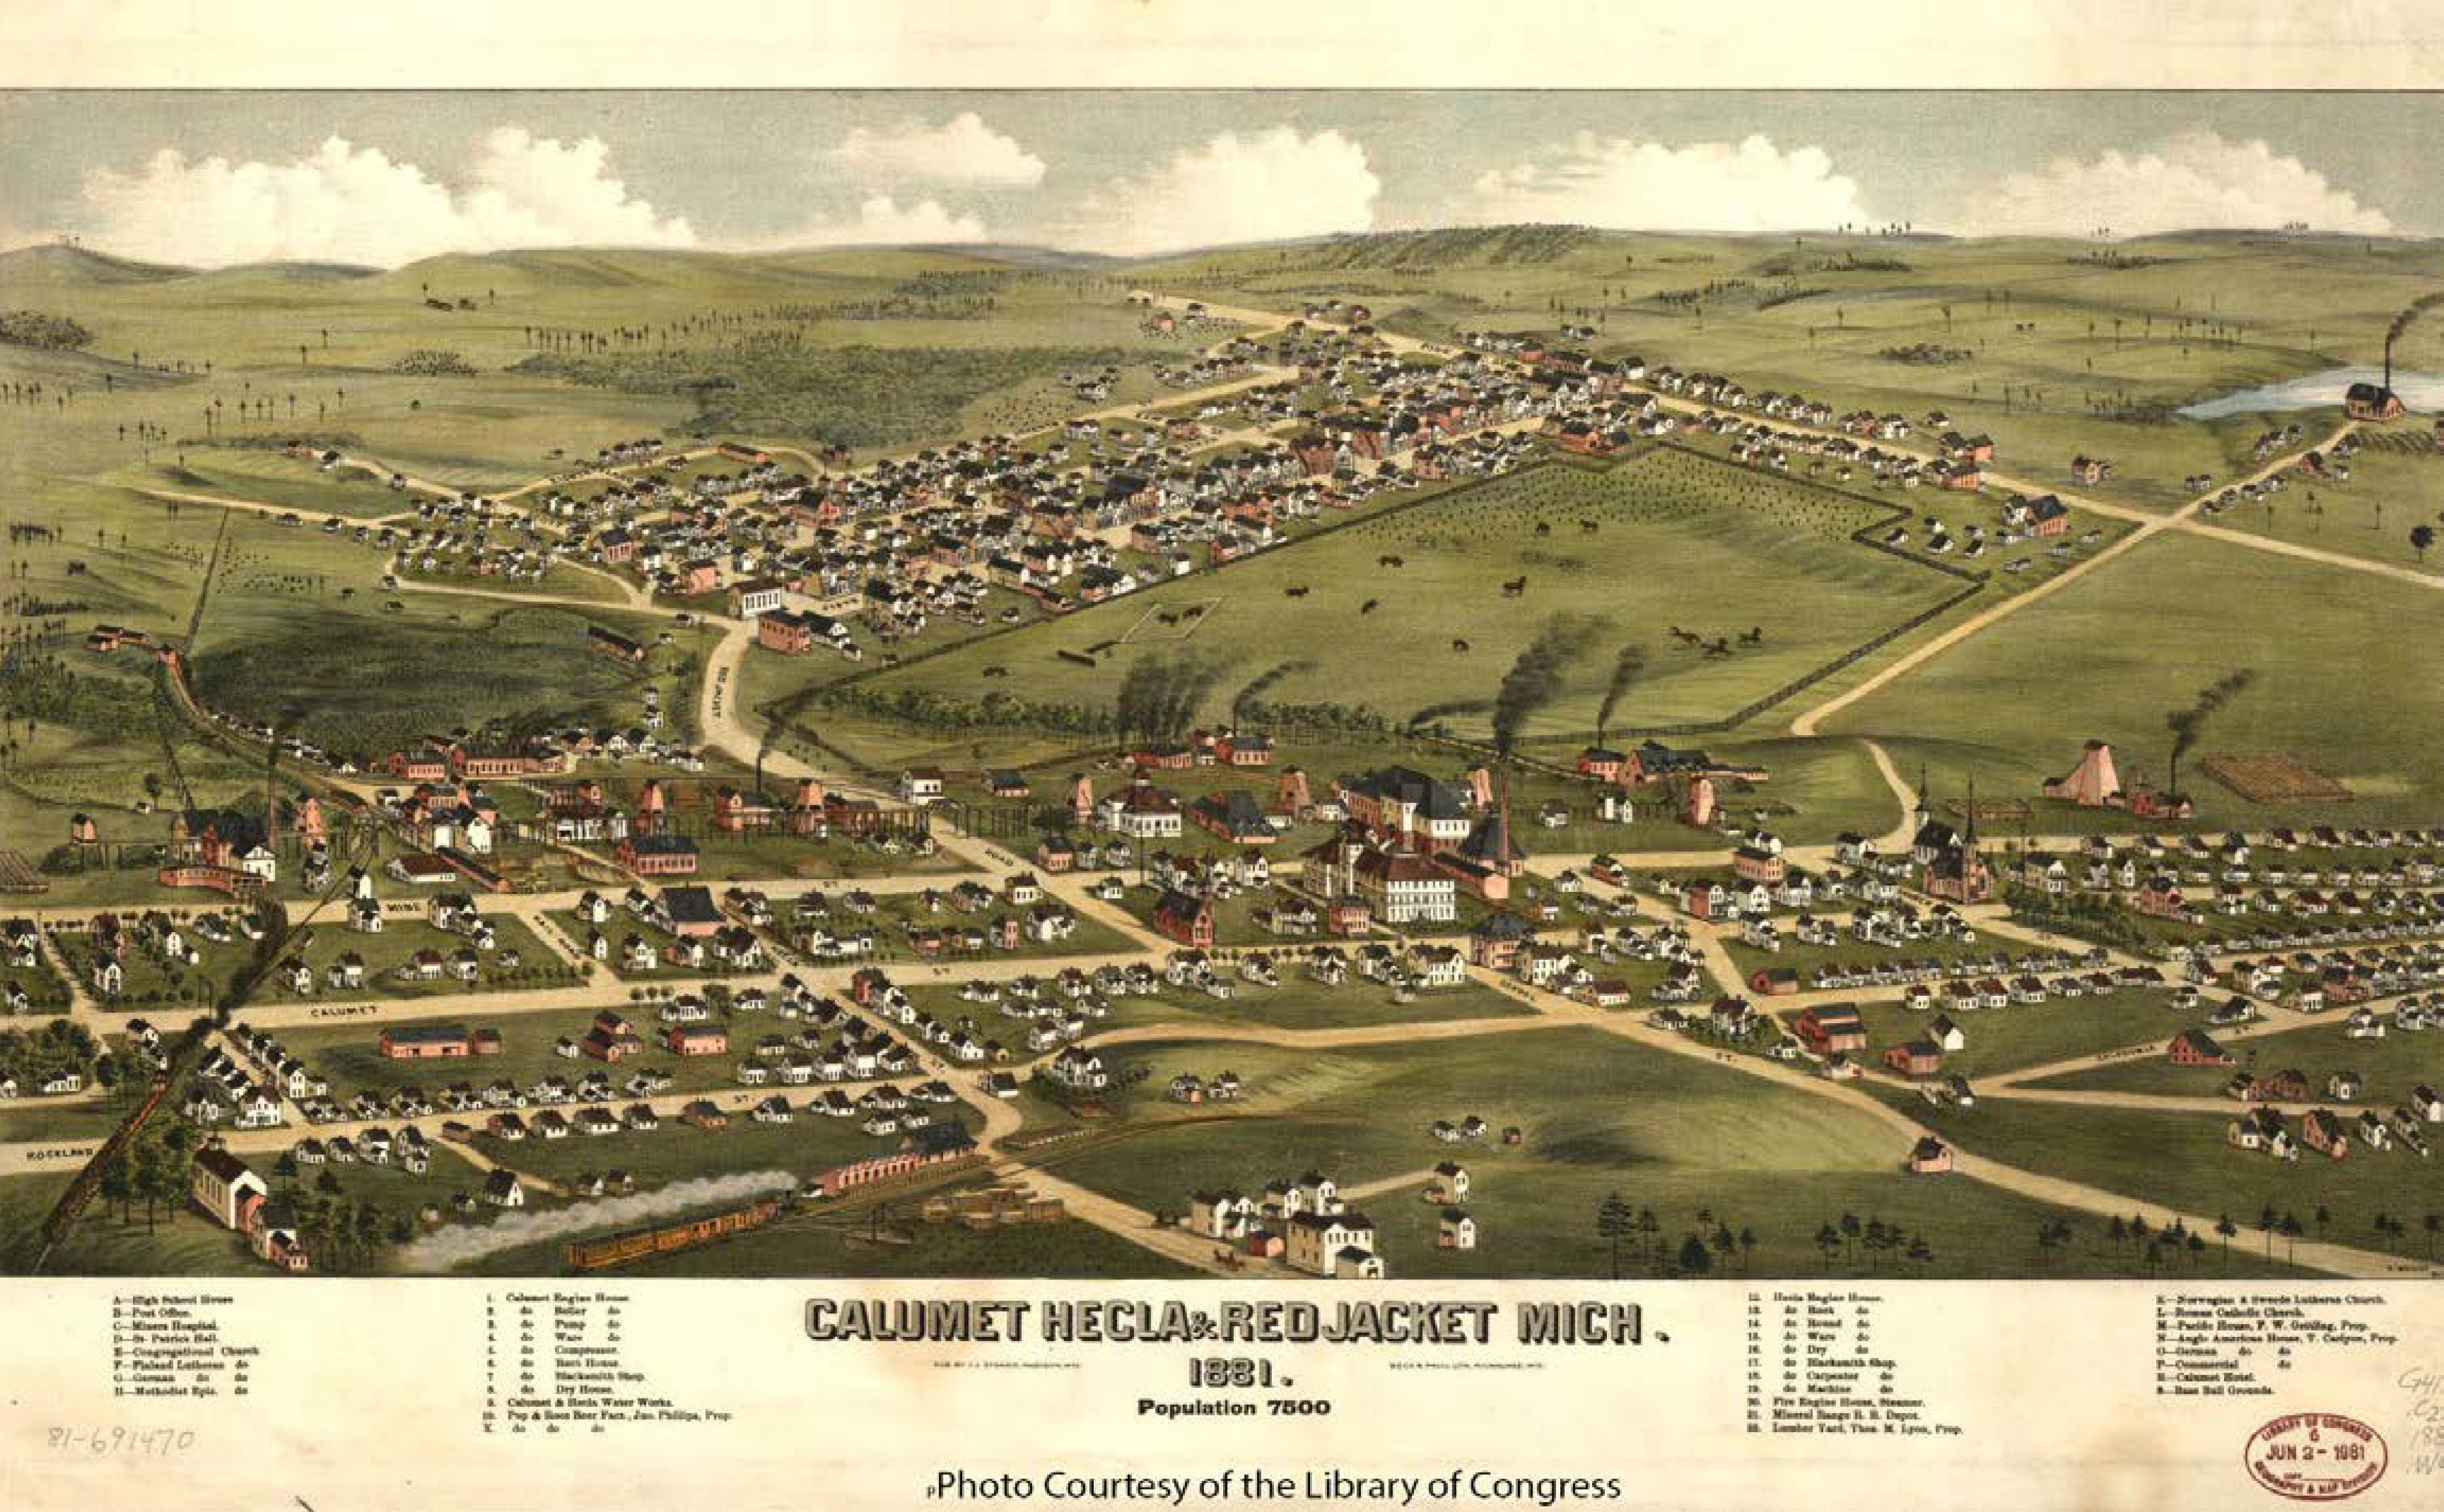 Calumet Visitor Center Lesson Plans